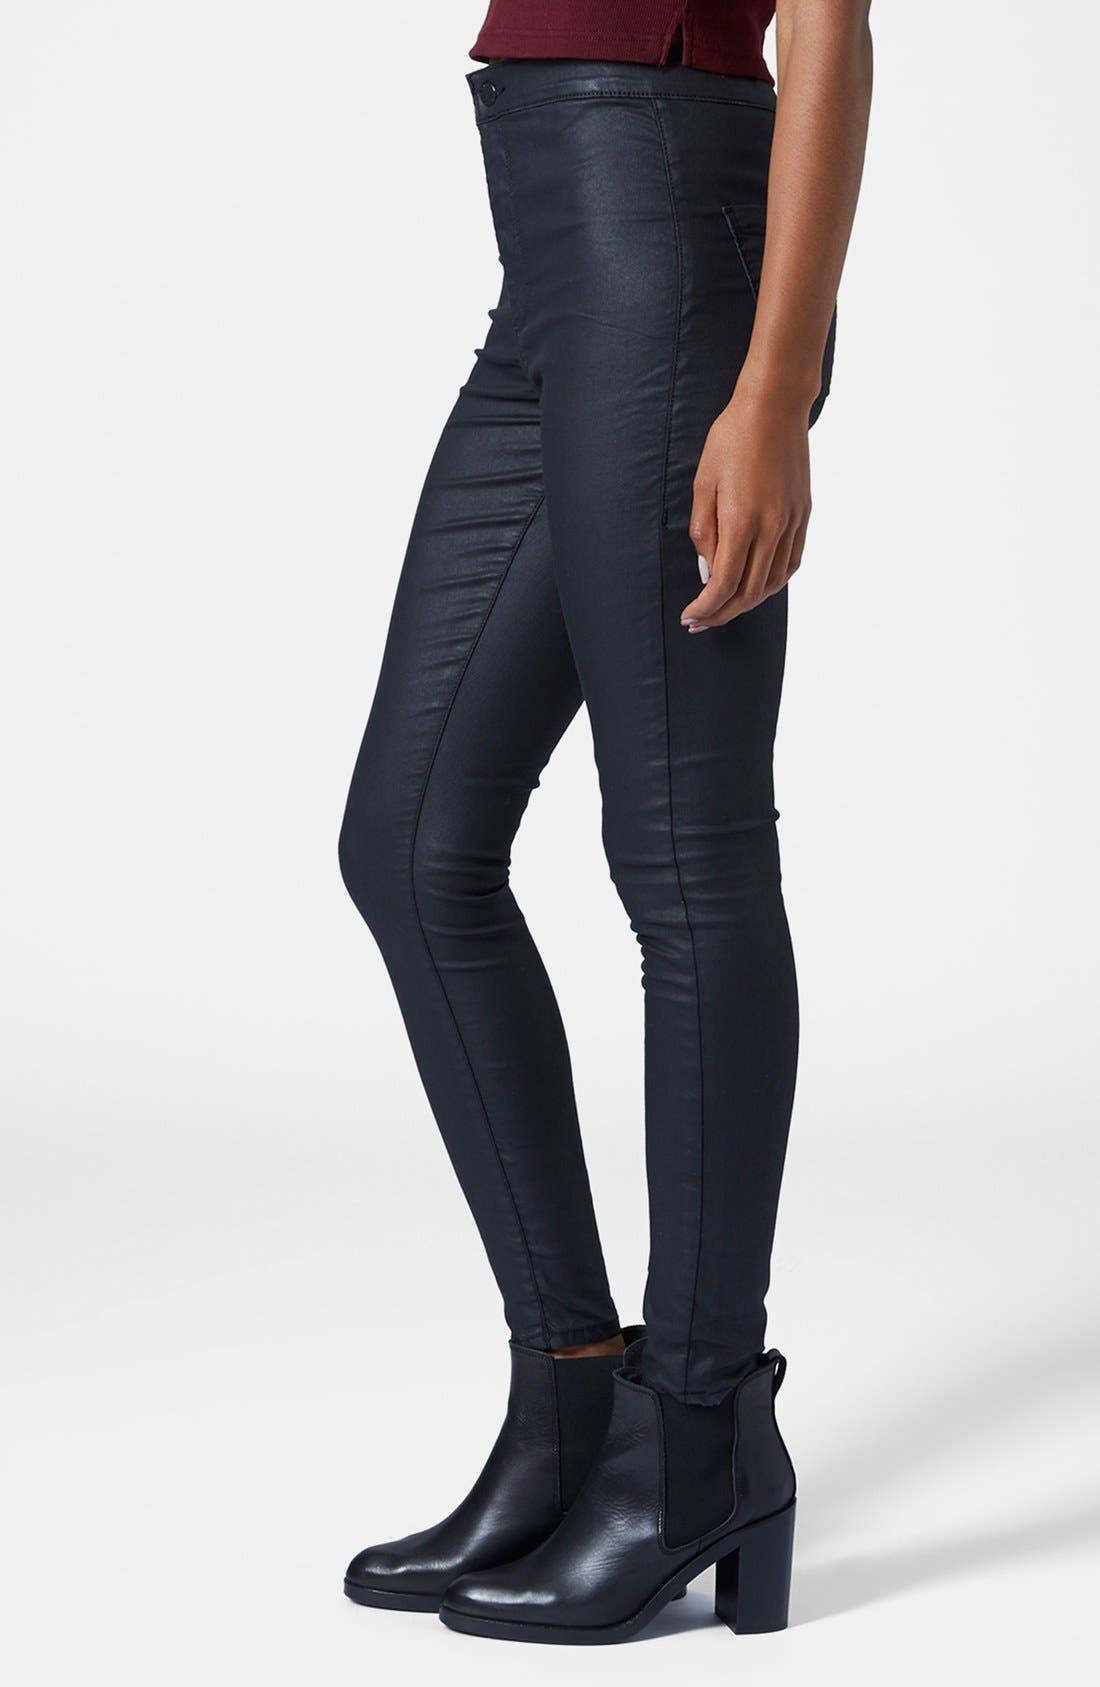 Alternate Image 1 Selected - Topshop Moto 'Joni' Coated Skinny Jeans (Black)